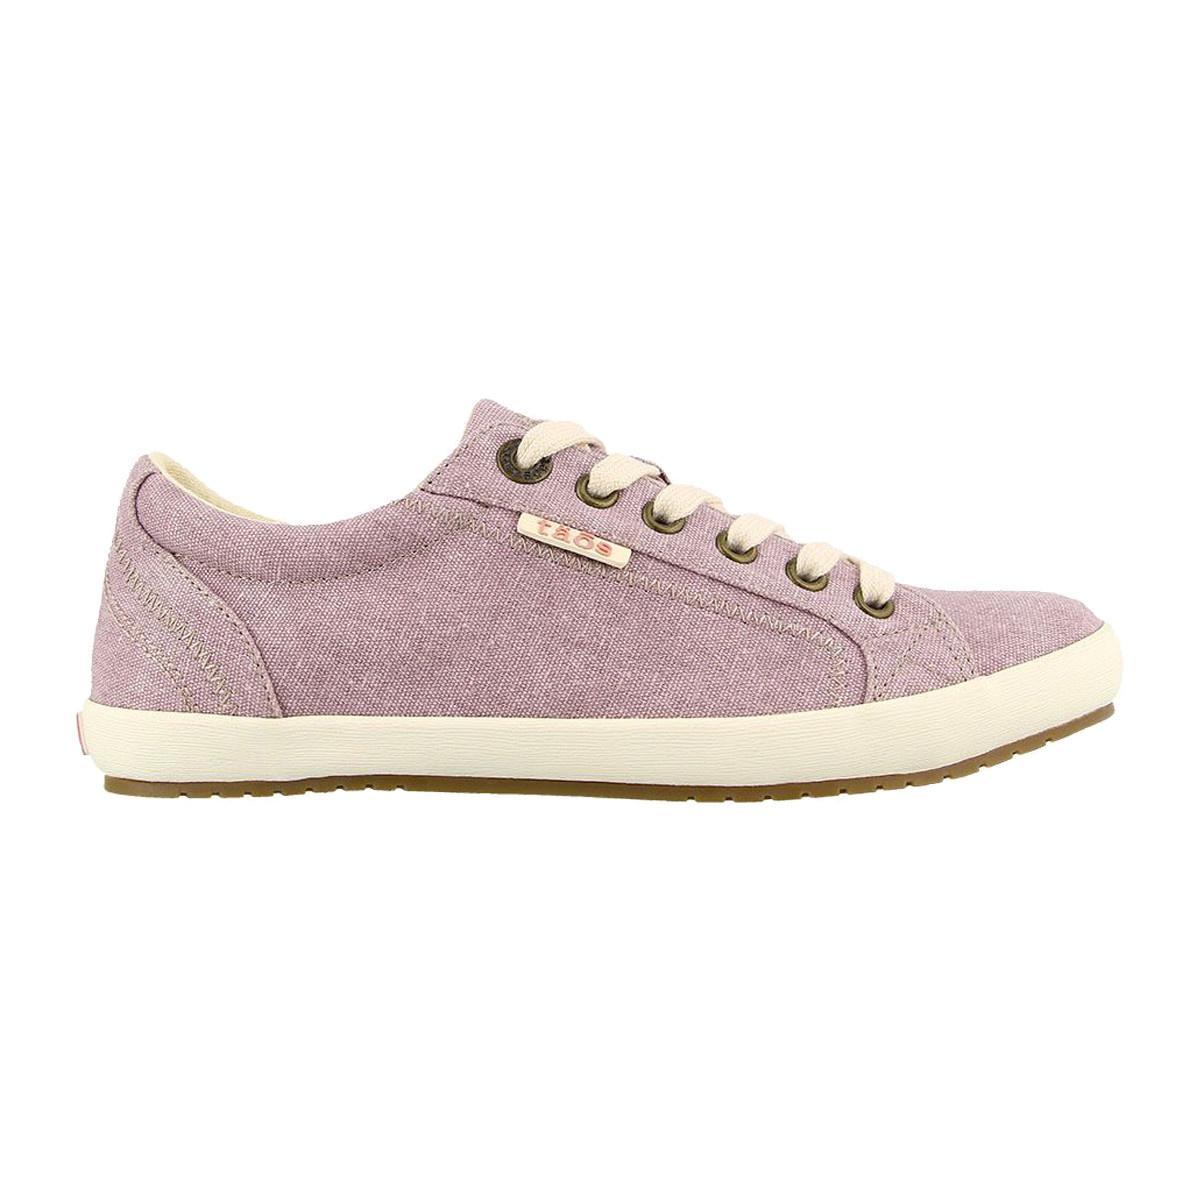 Taos Footwear Taos Women's Star Mauve Sneaker